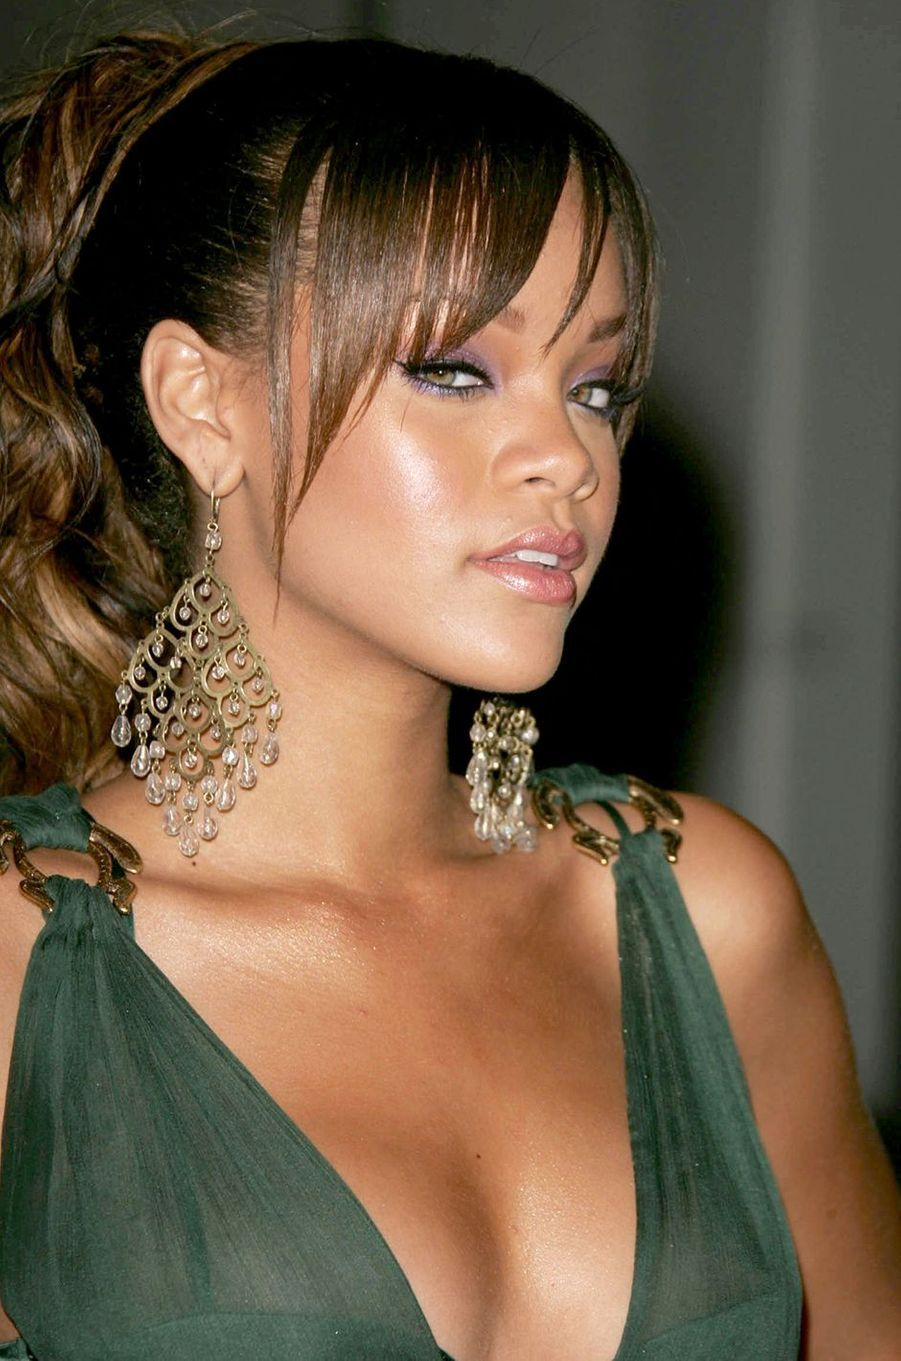 Rihanna aux World Music Awards à Los Angeles en août 2005